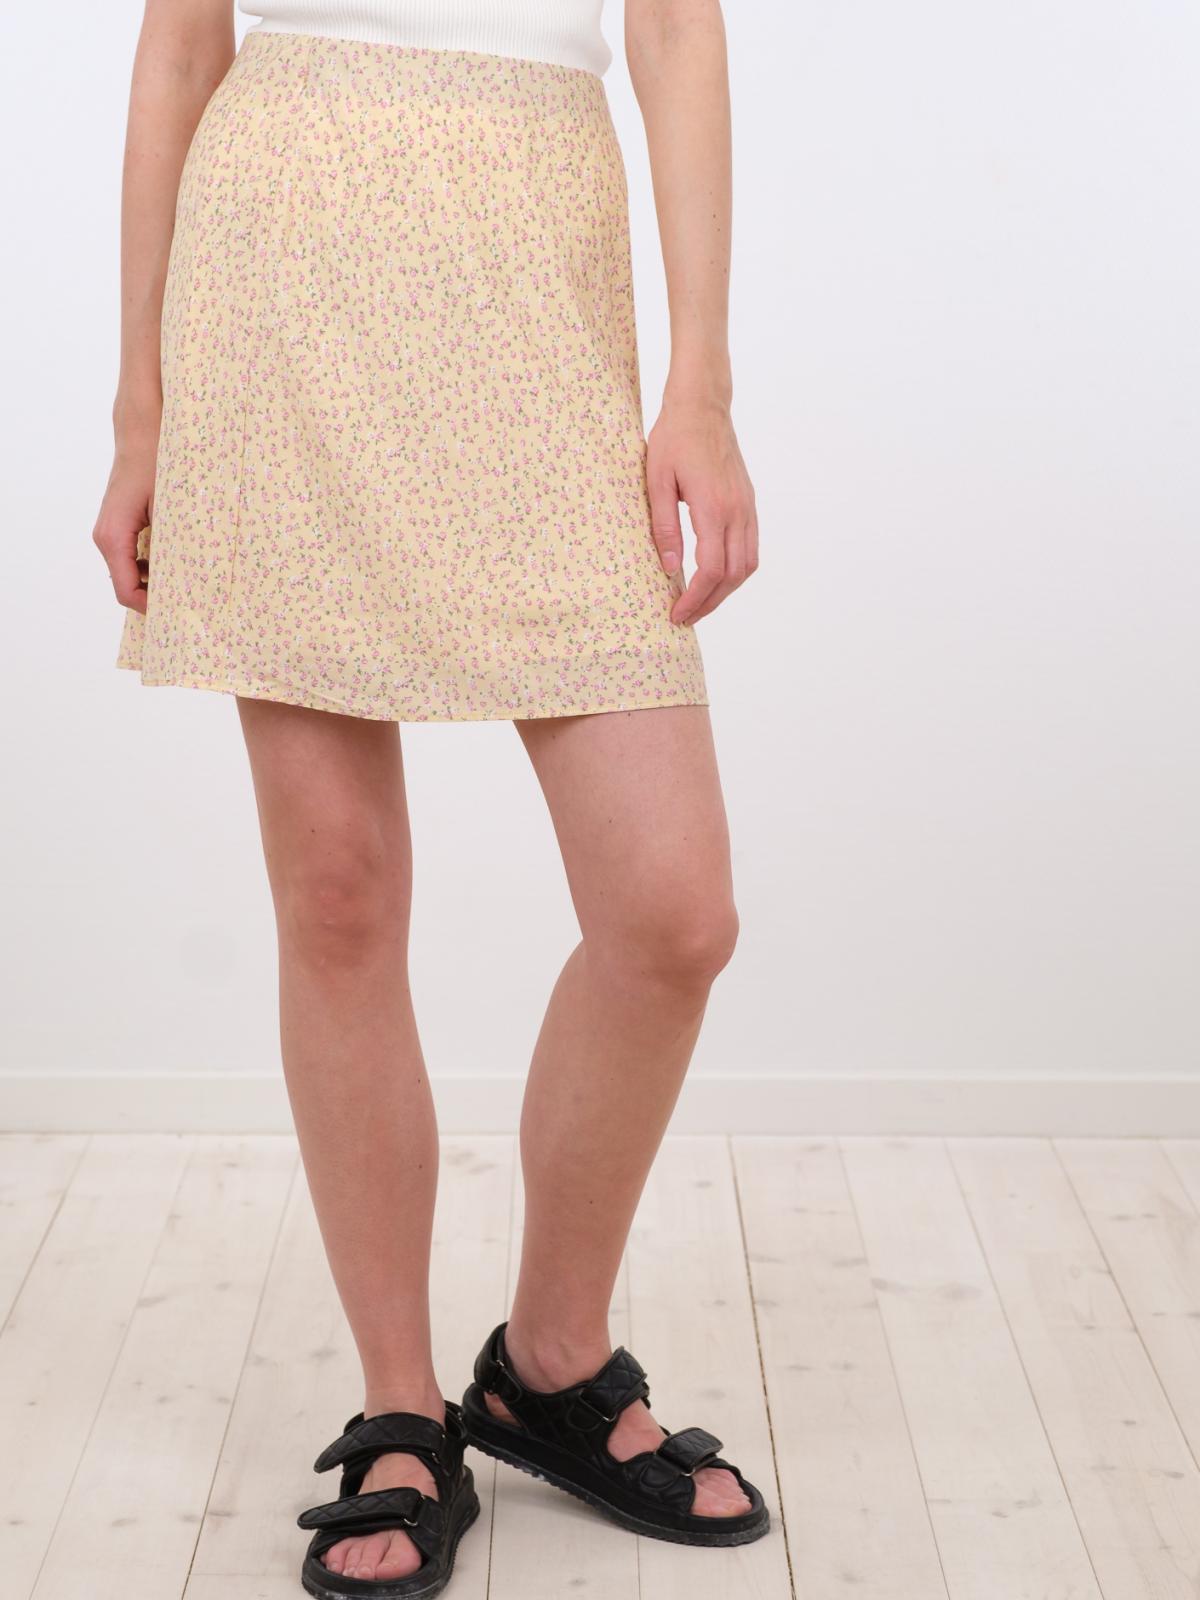 Neo Noir Lunna Summer Rose nederdel, light yellow, 34